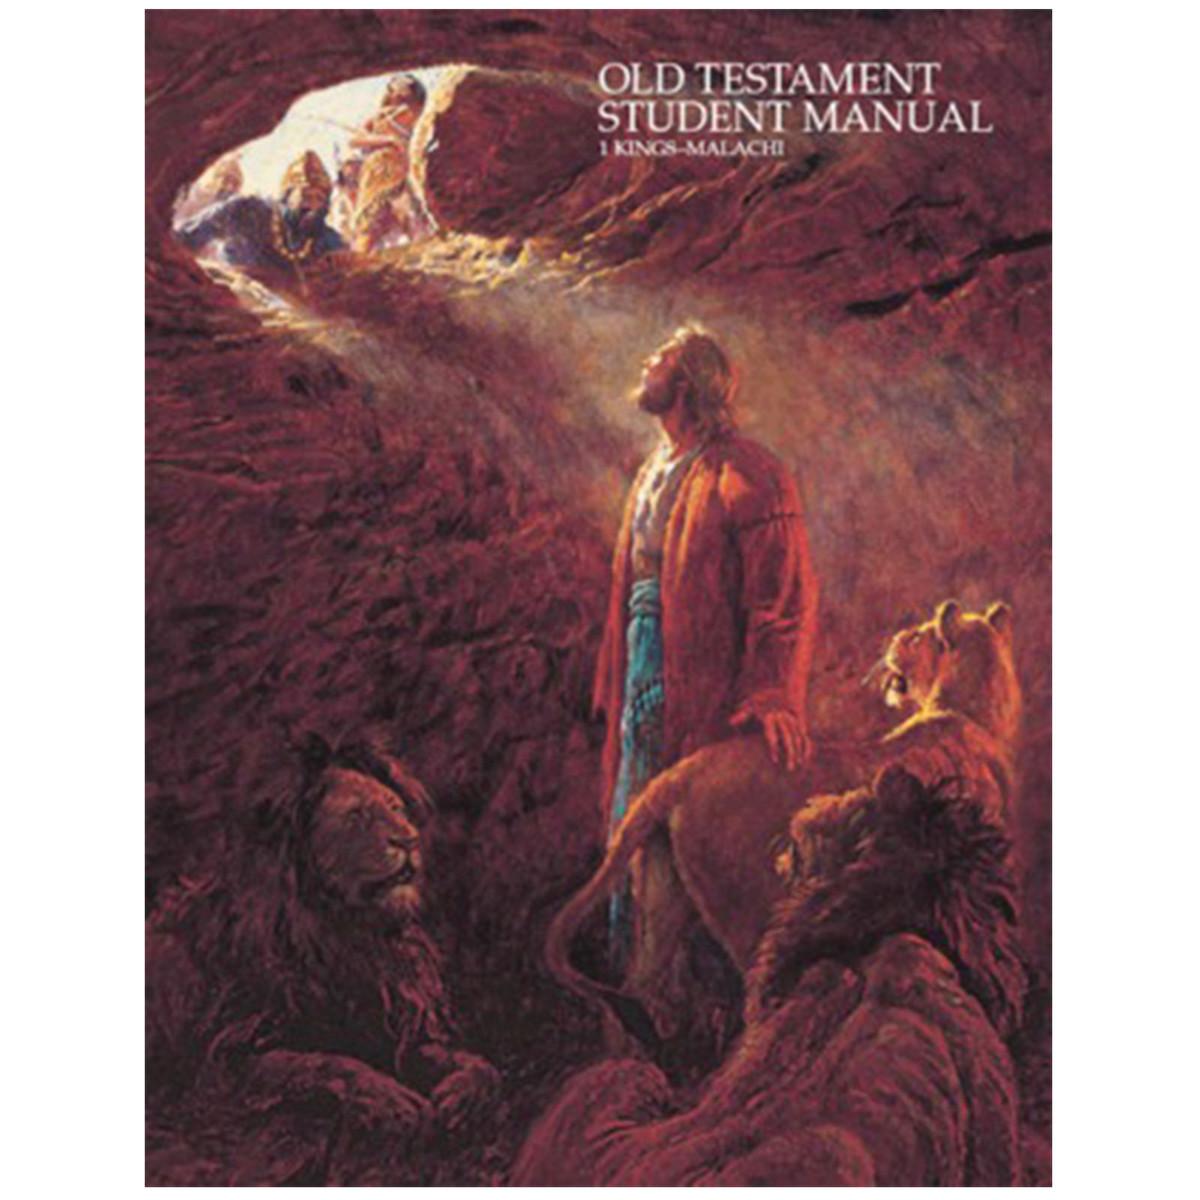 Doctrine & covenatns and church history seminary student study.